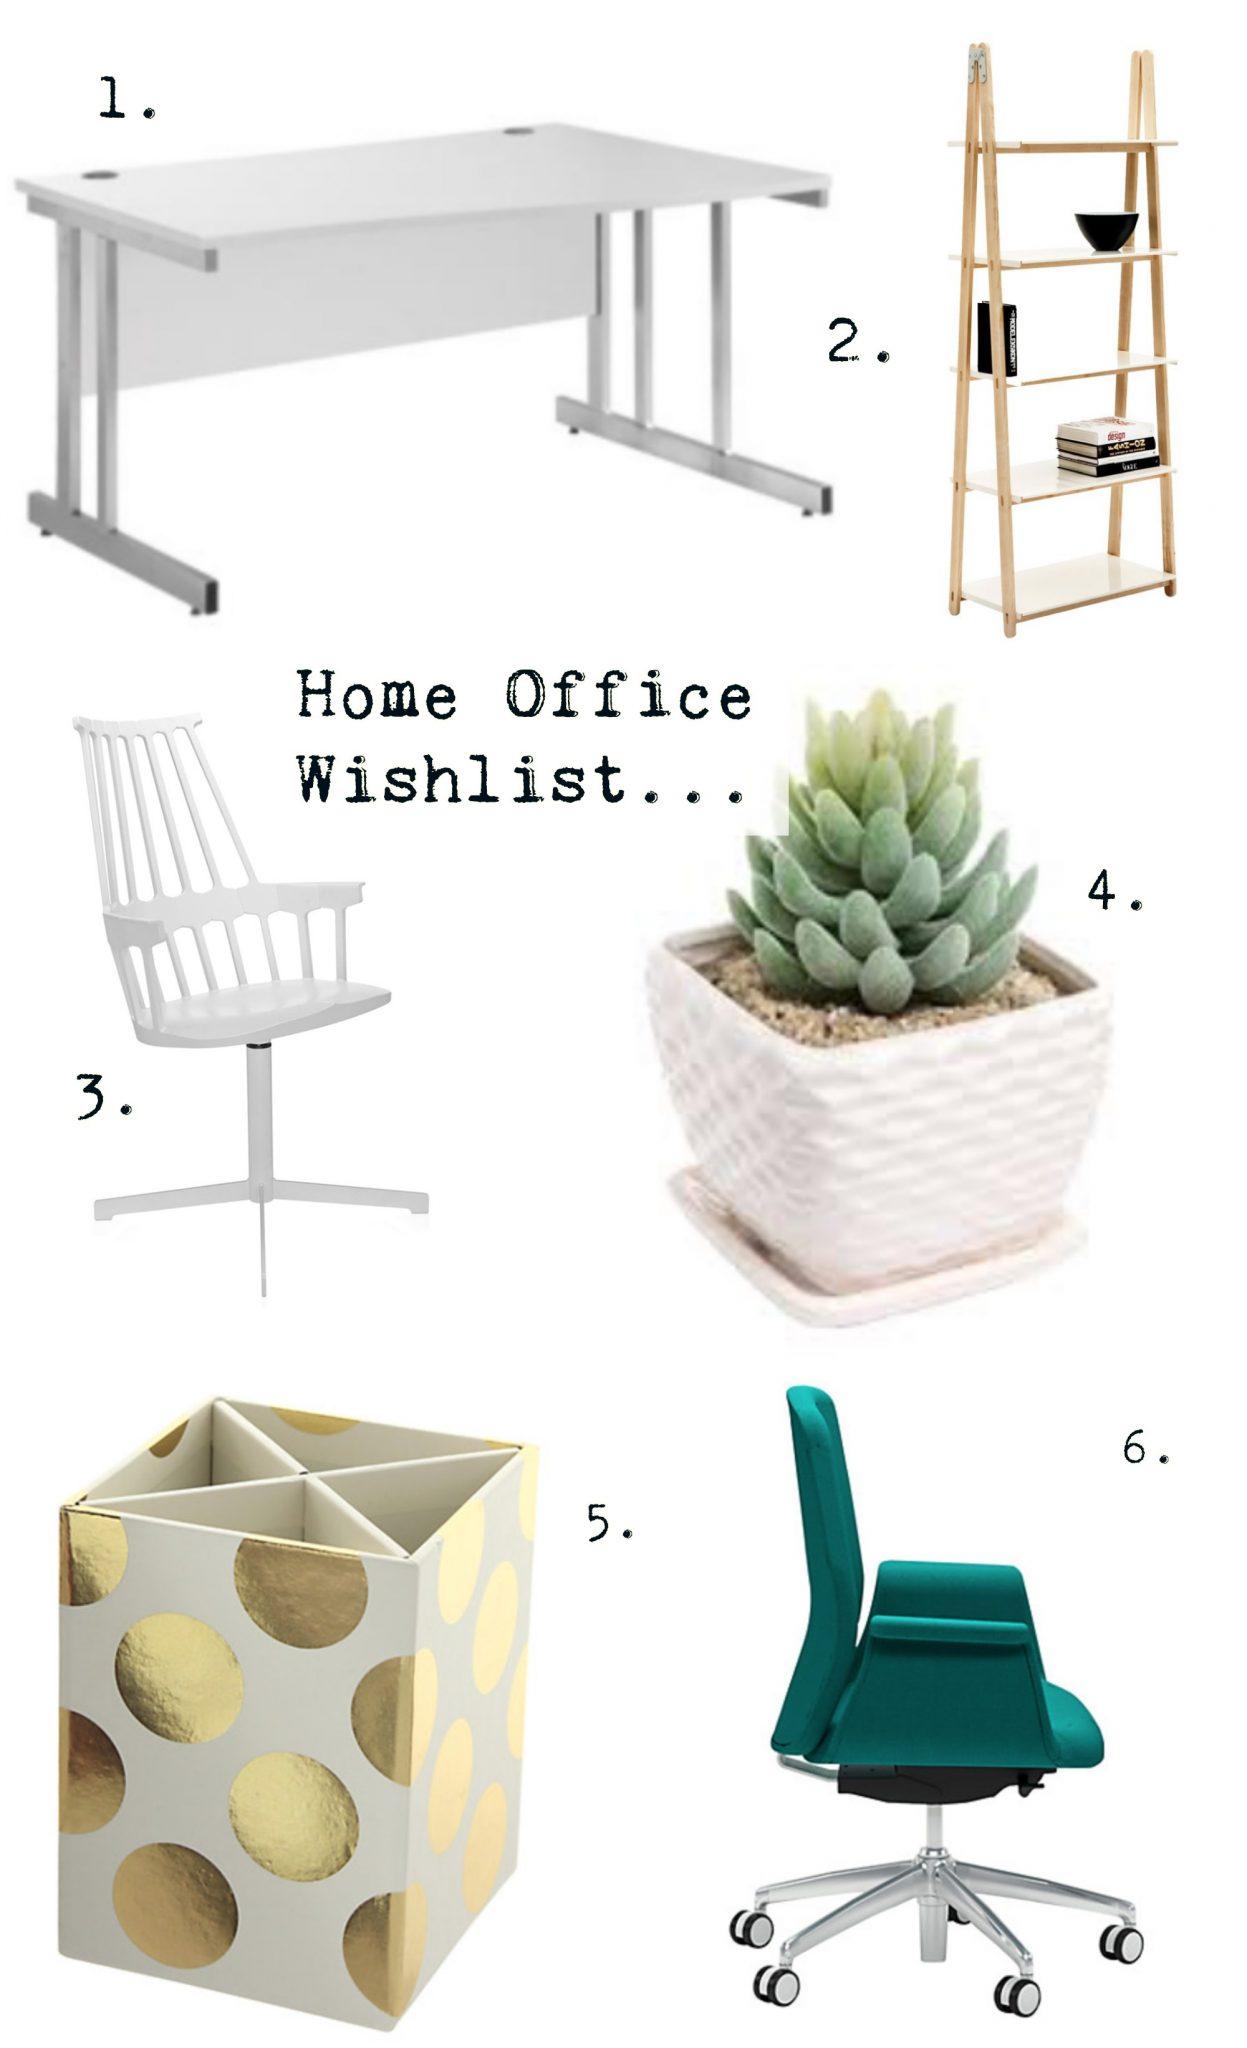 home-office-wishlist